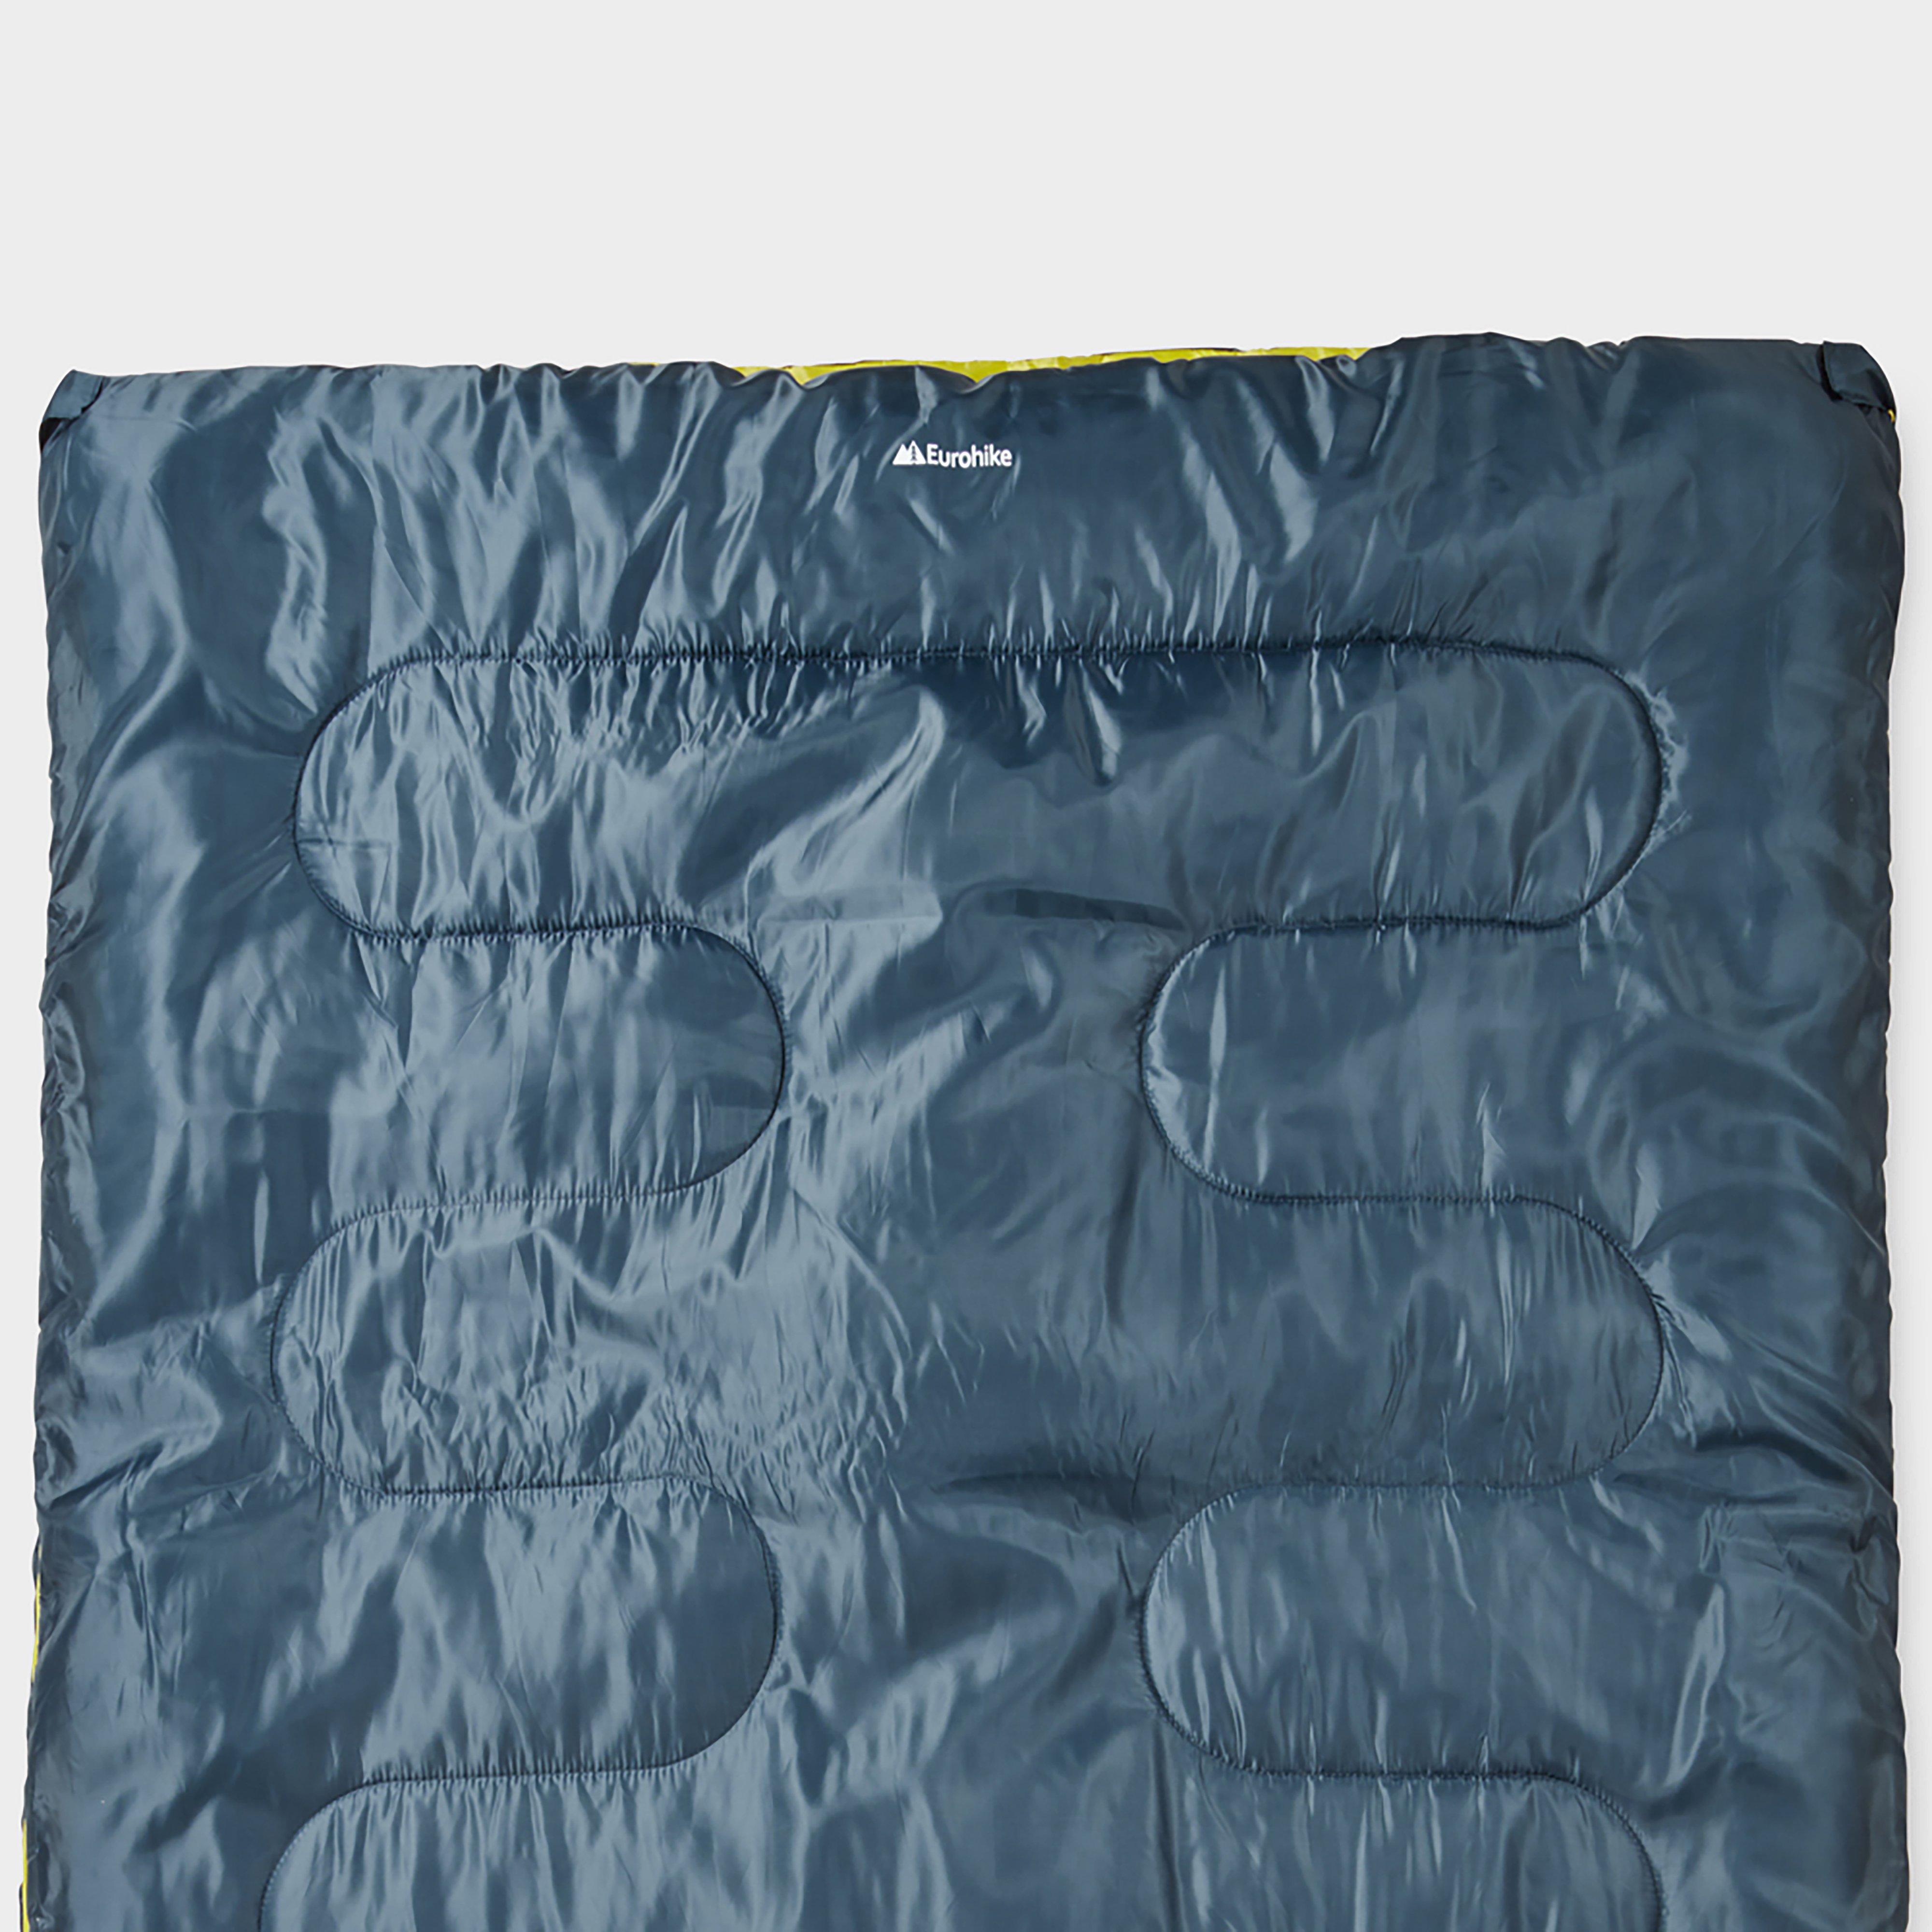 Eurohike Eurohike Snooze Double Sleeping Bag - Navy, Navy